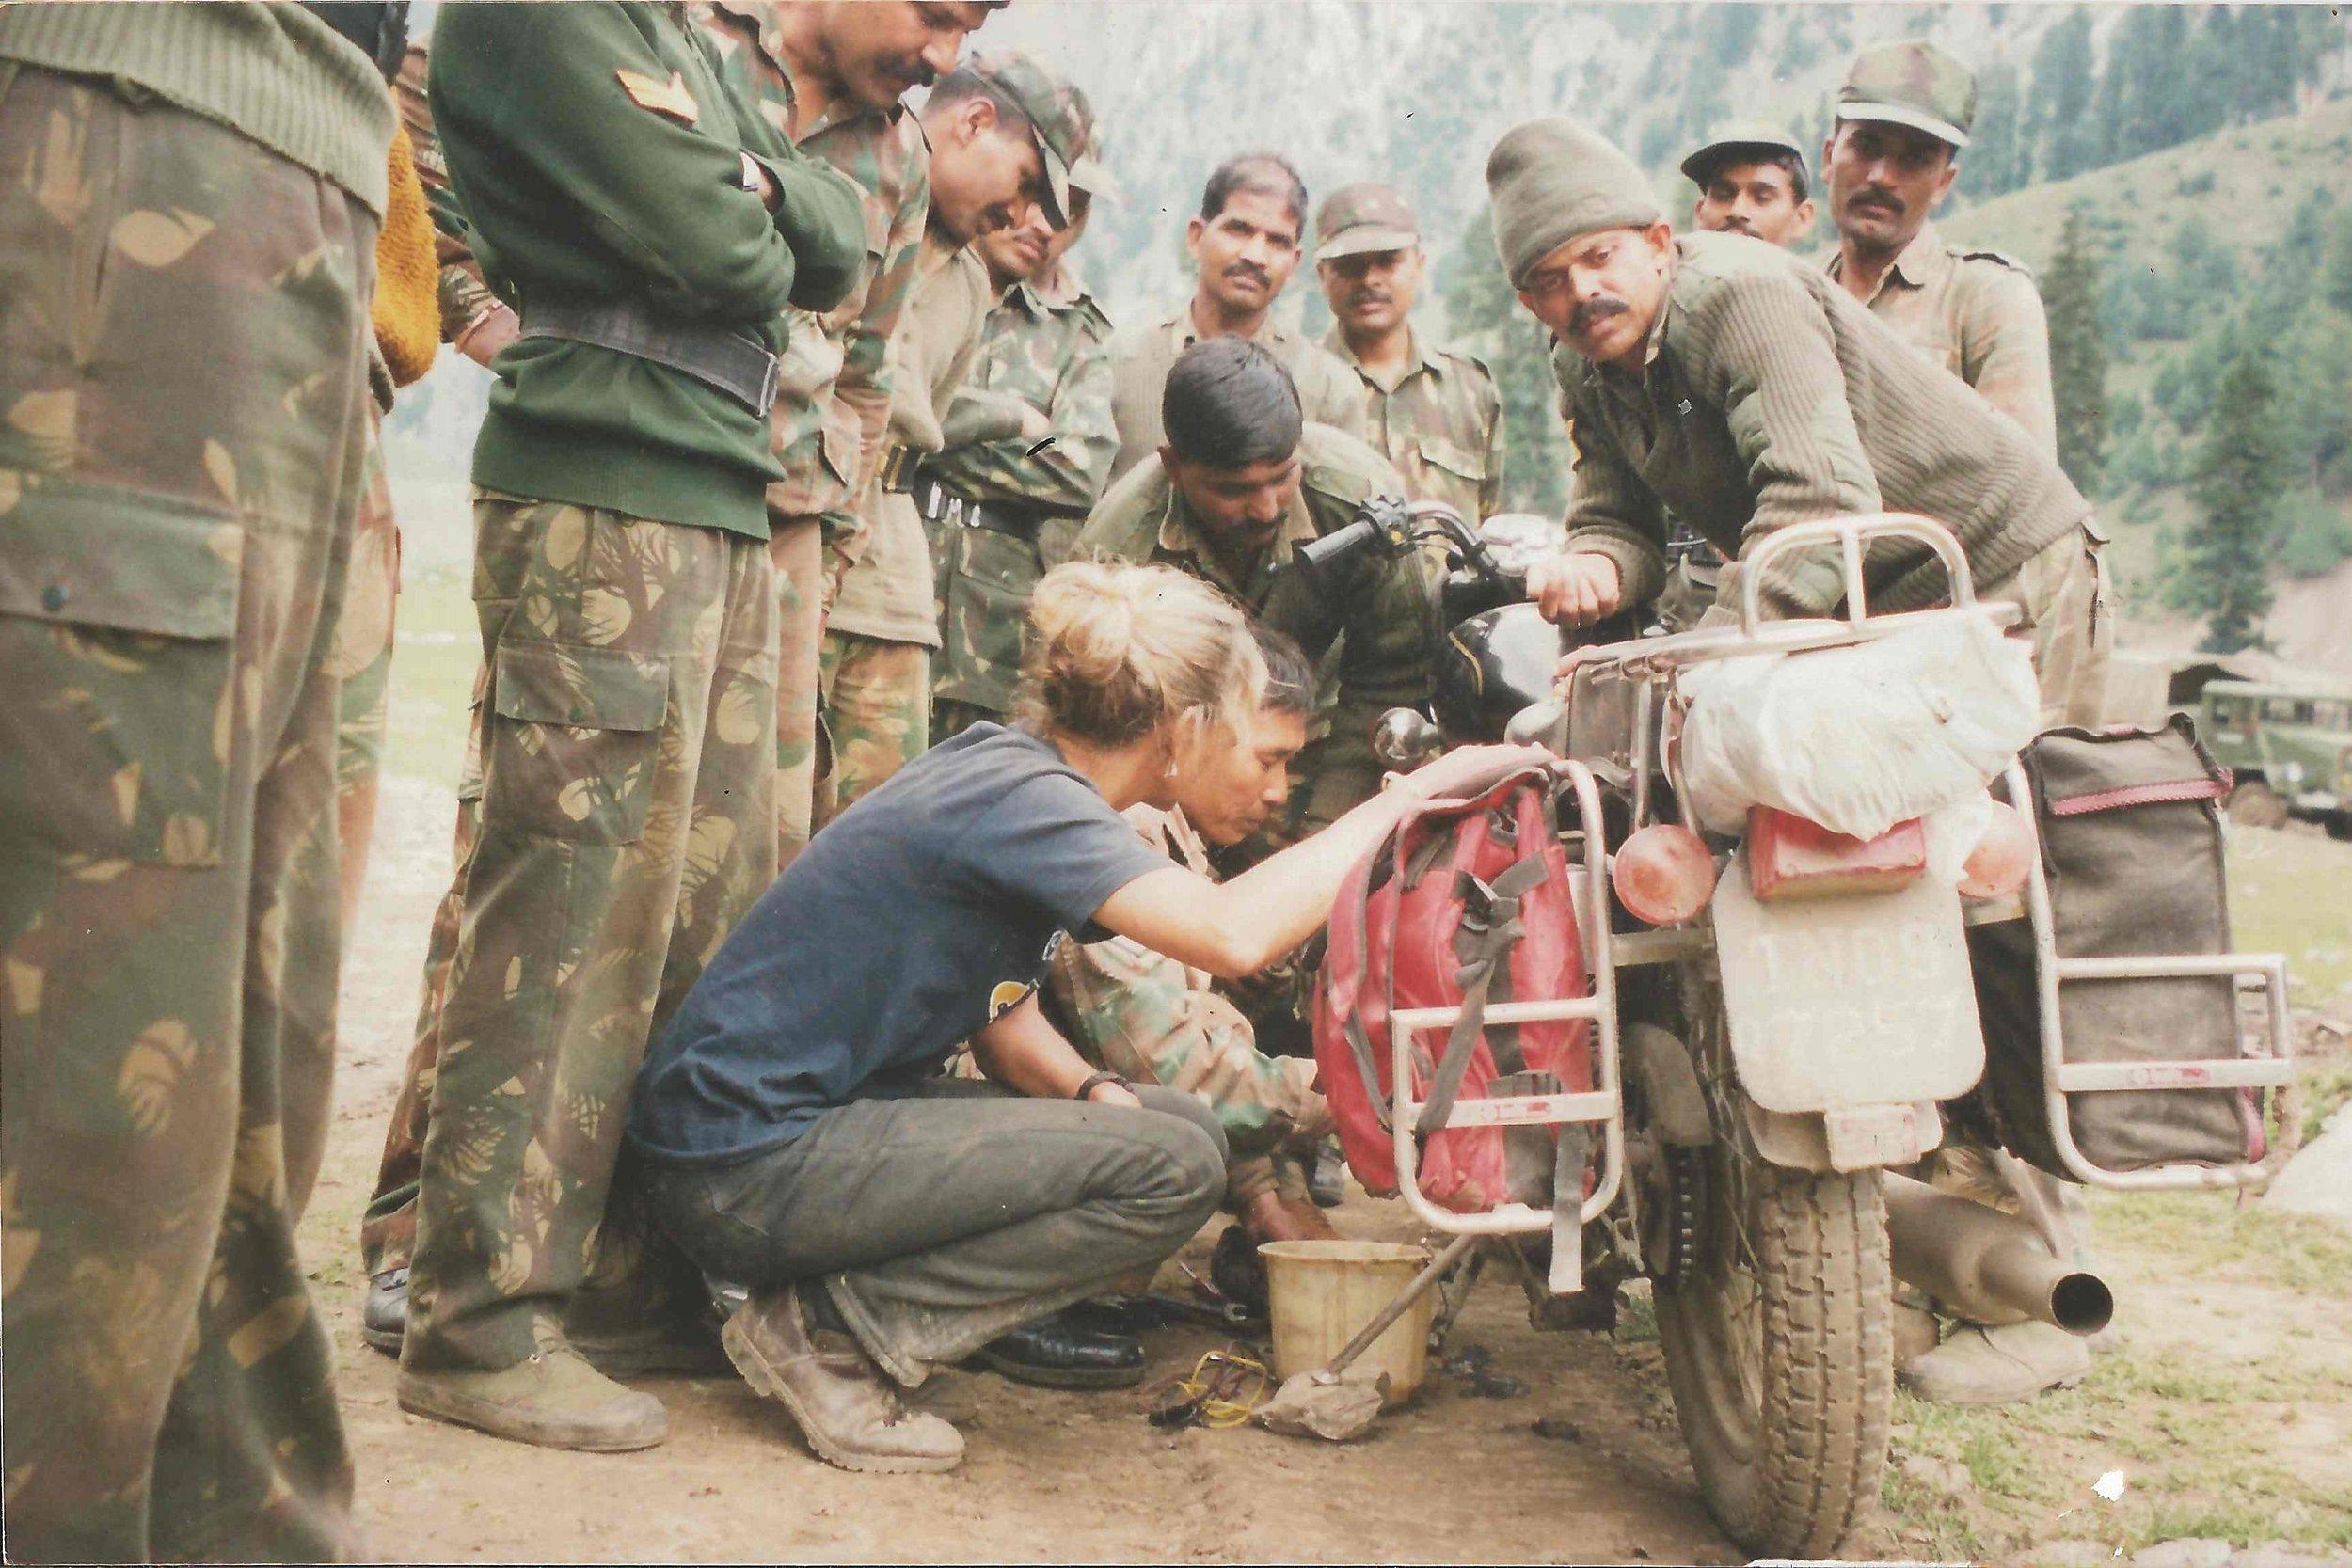 Jacqui-Furneaux-moto-adventure-rider-radio.jpg